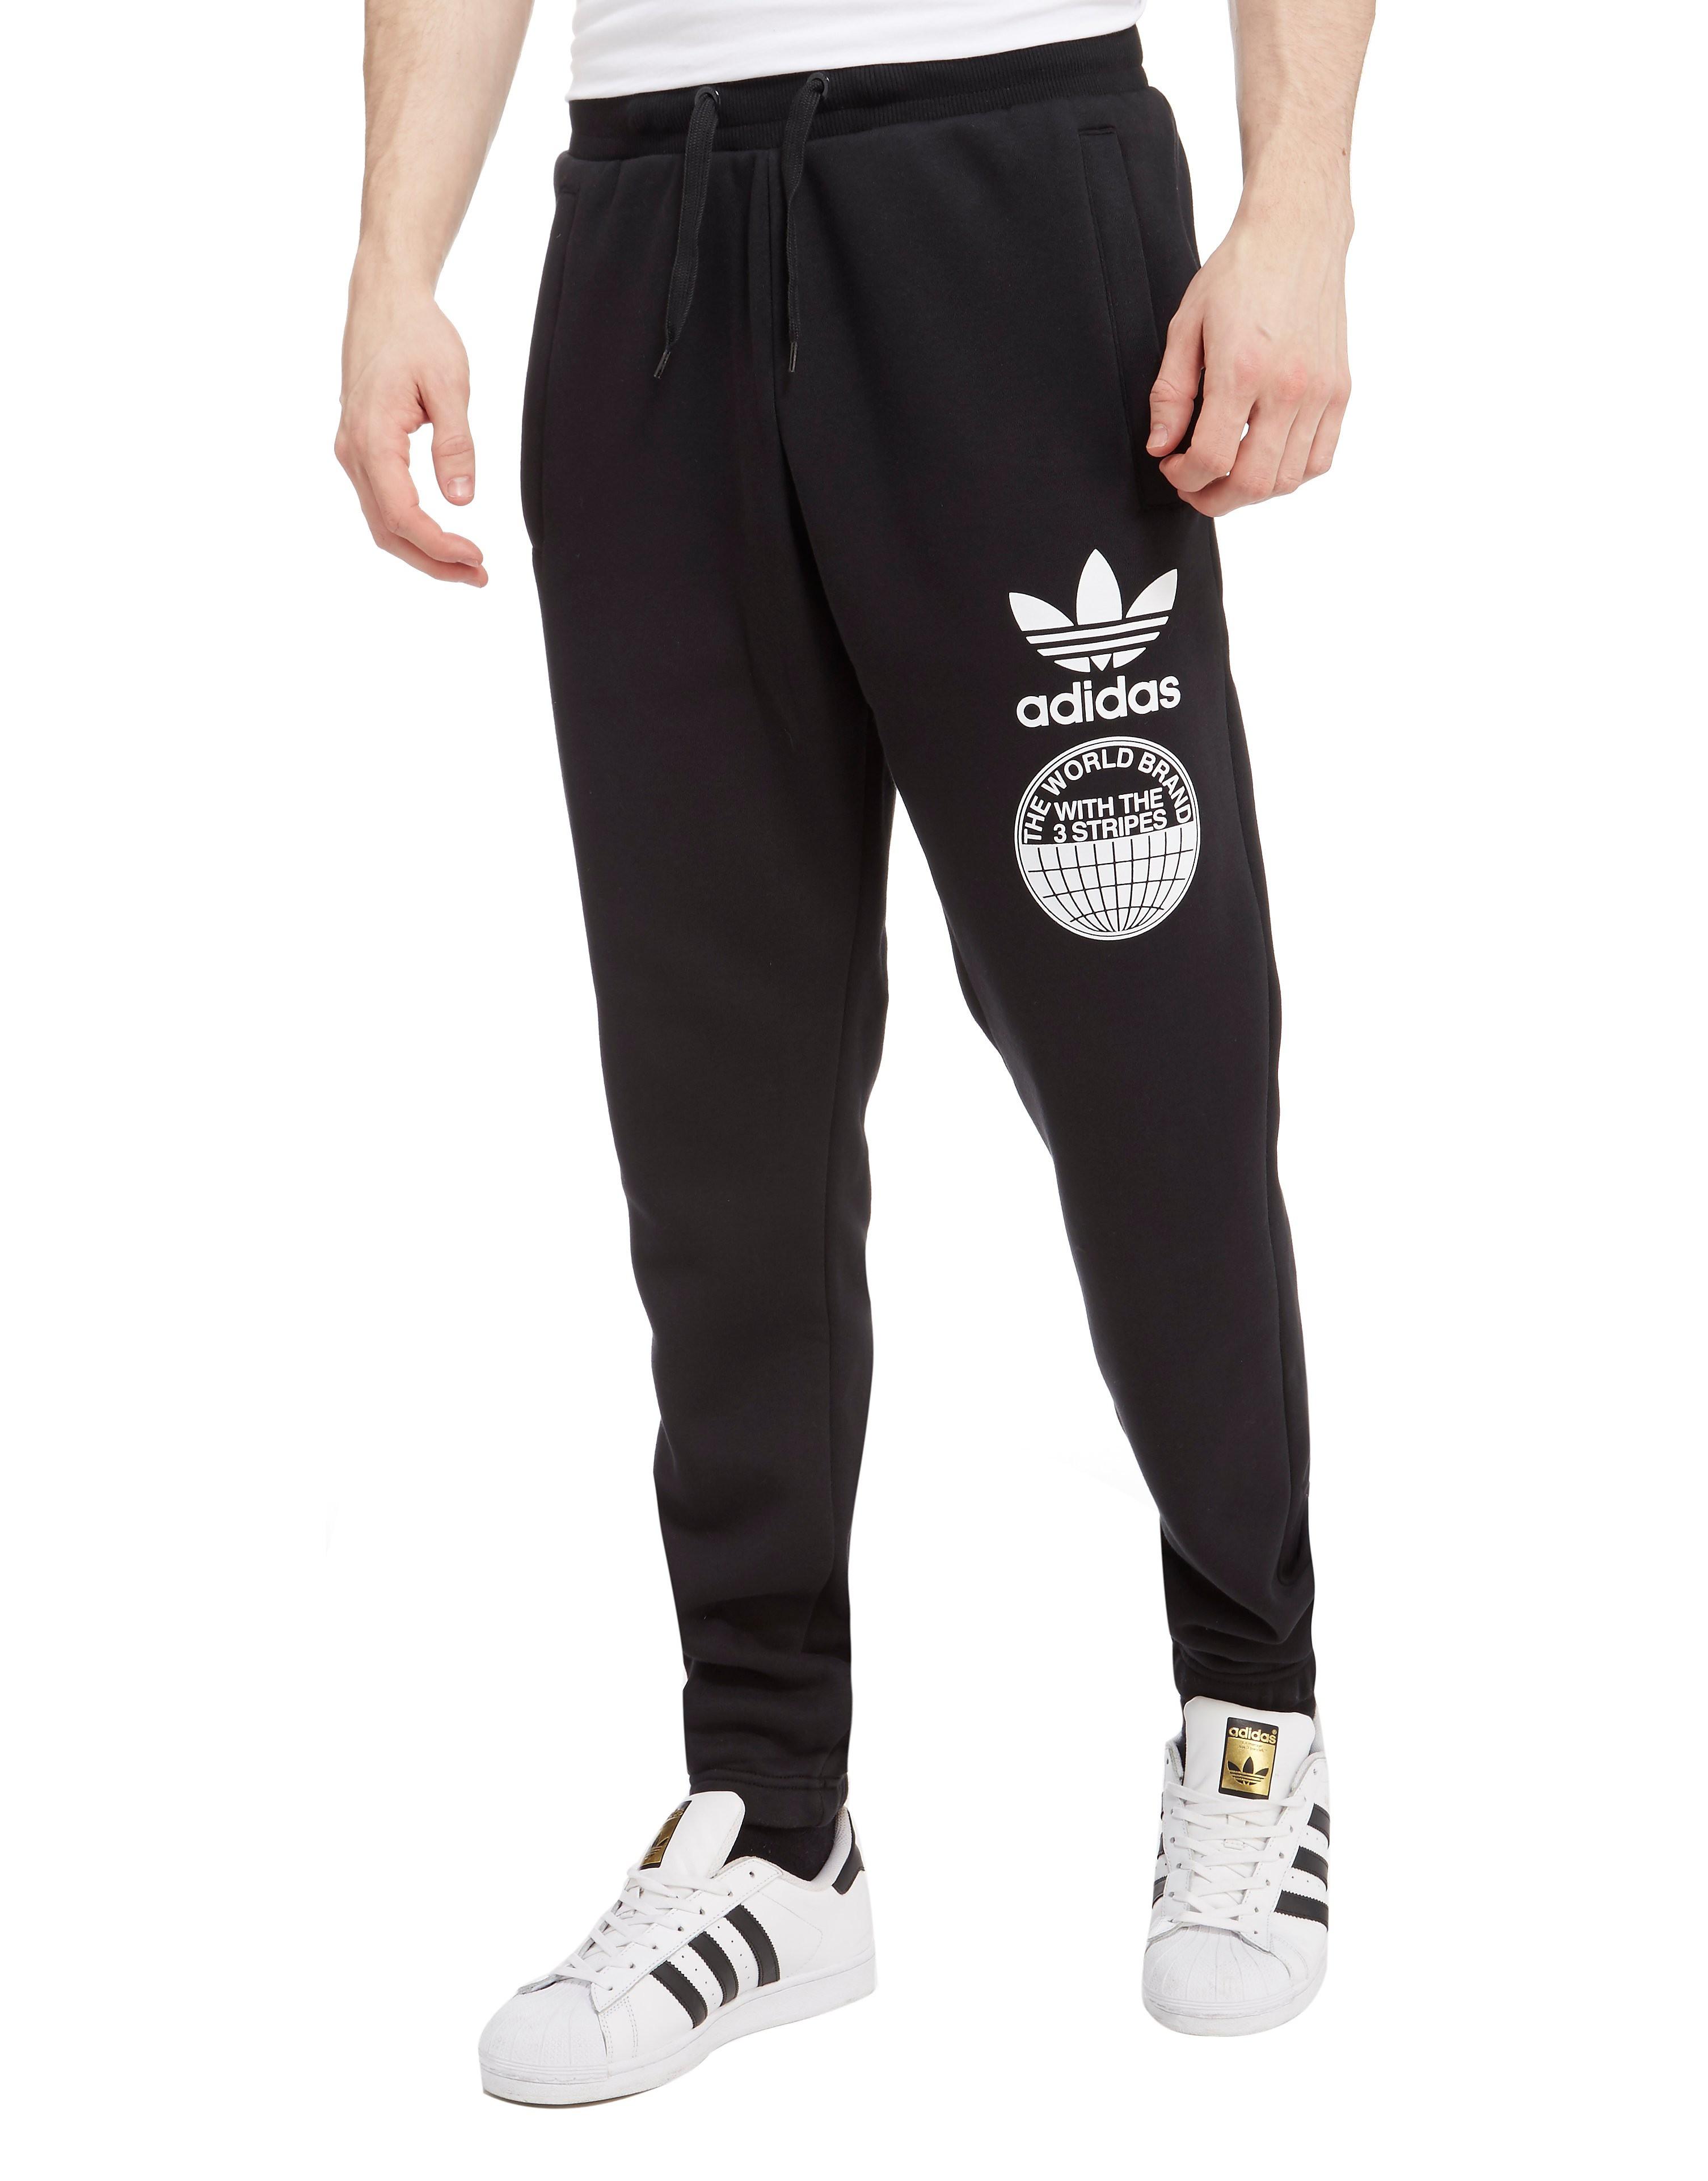 adidas Originals Global Fleece Pants